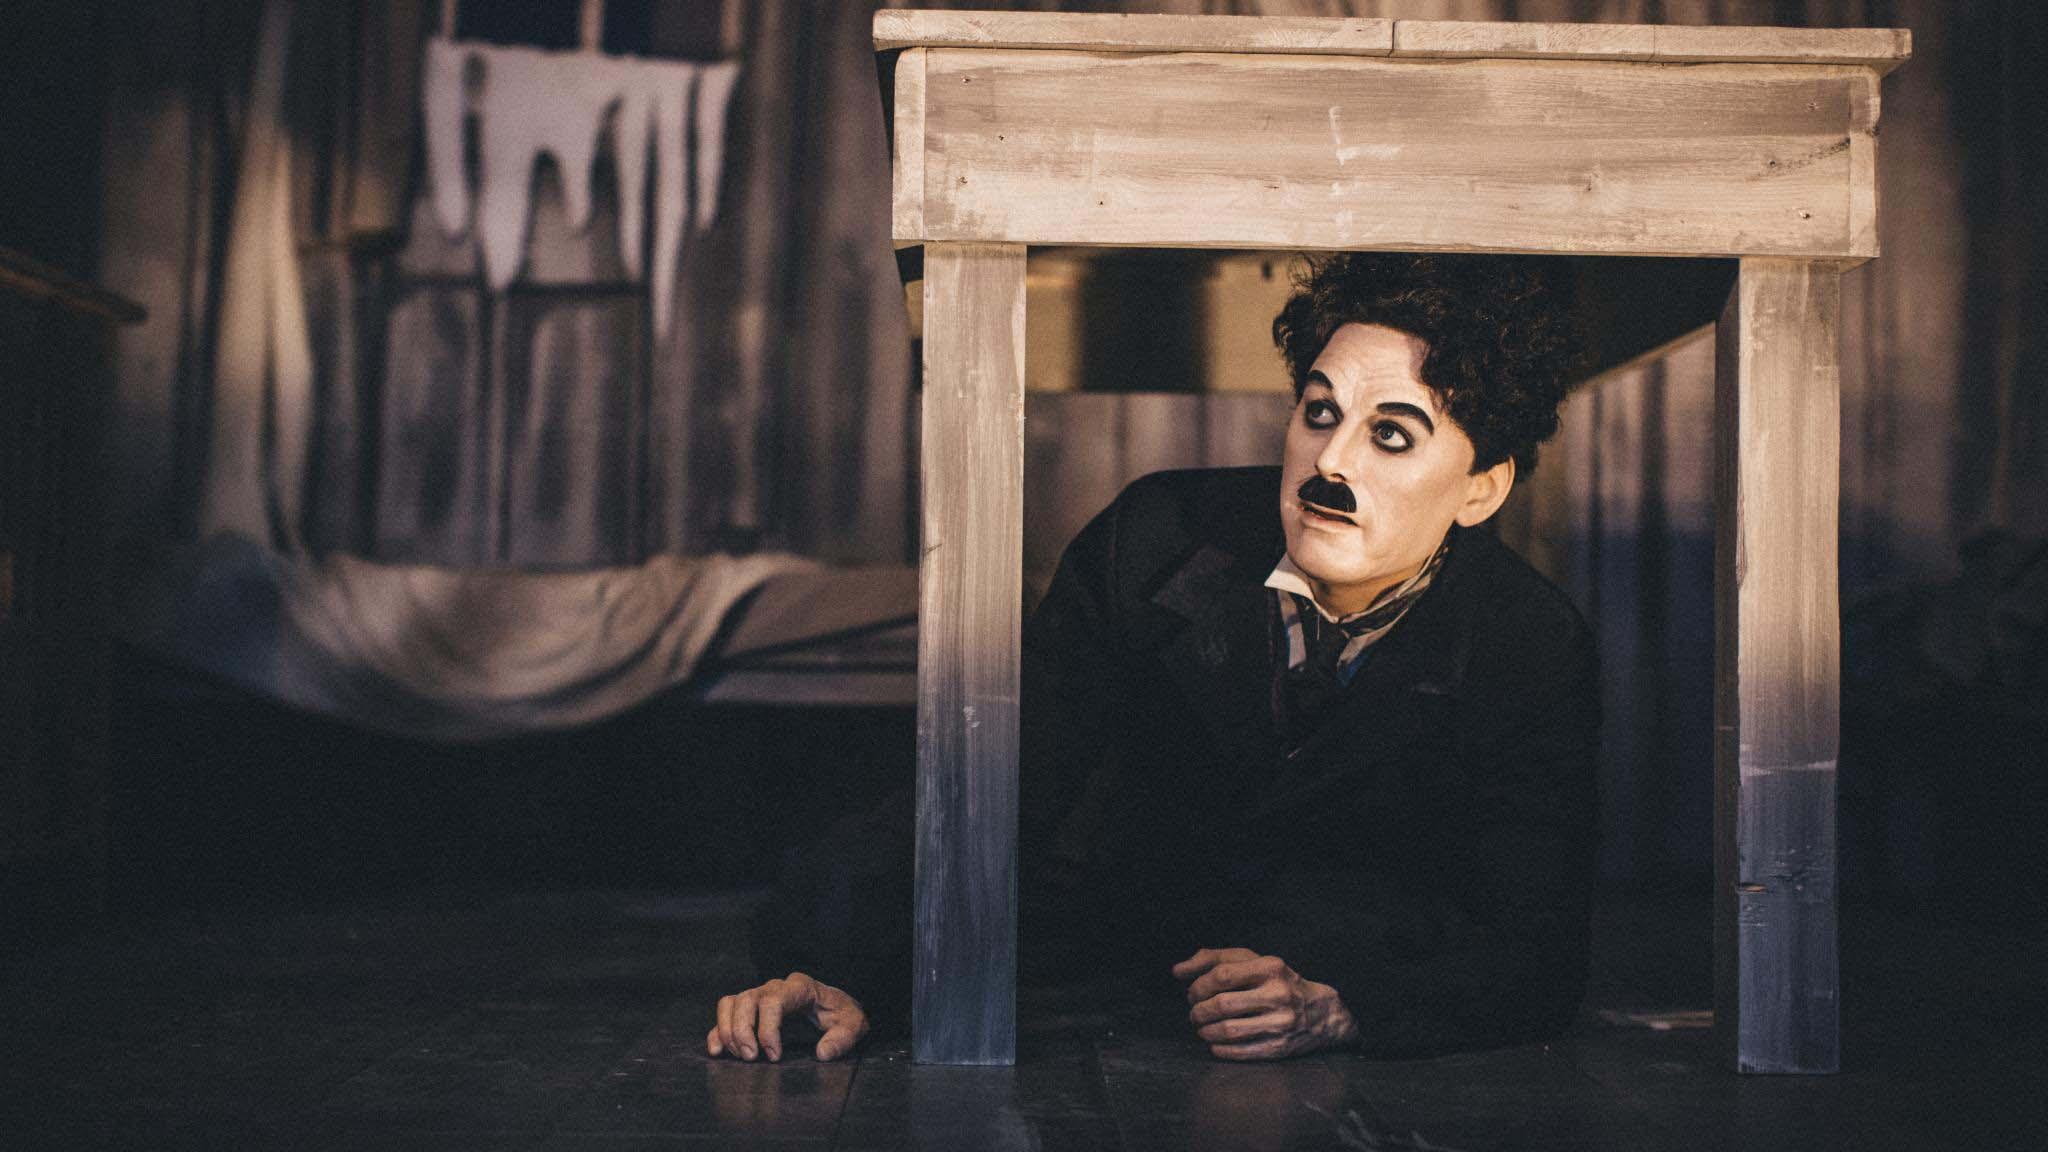 Charlie Chaplin, actor, movies, Switzerland, Chaplin's World museum